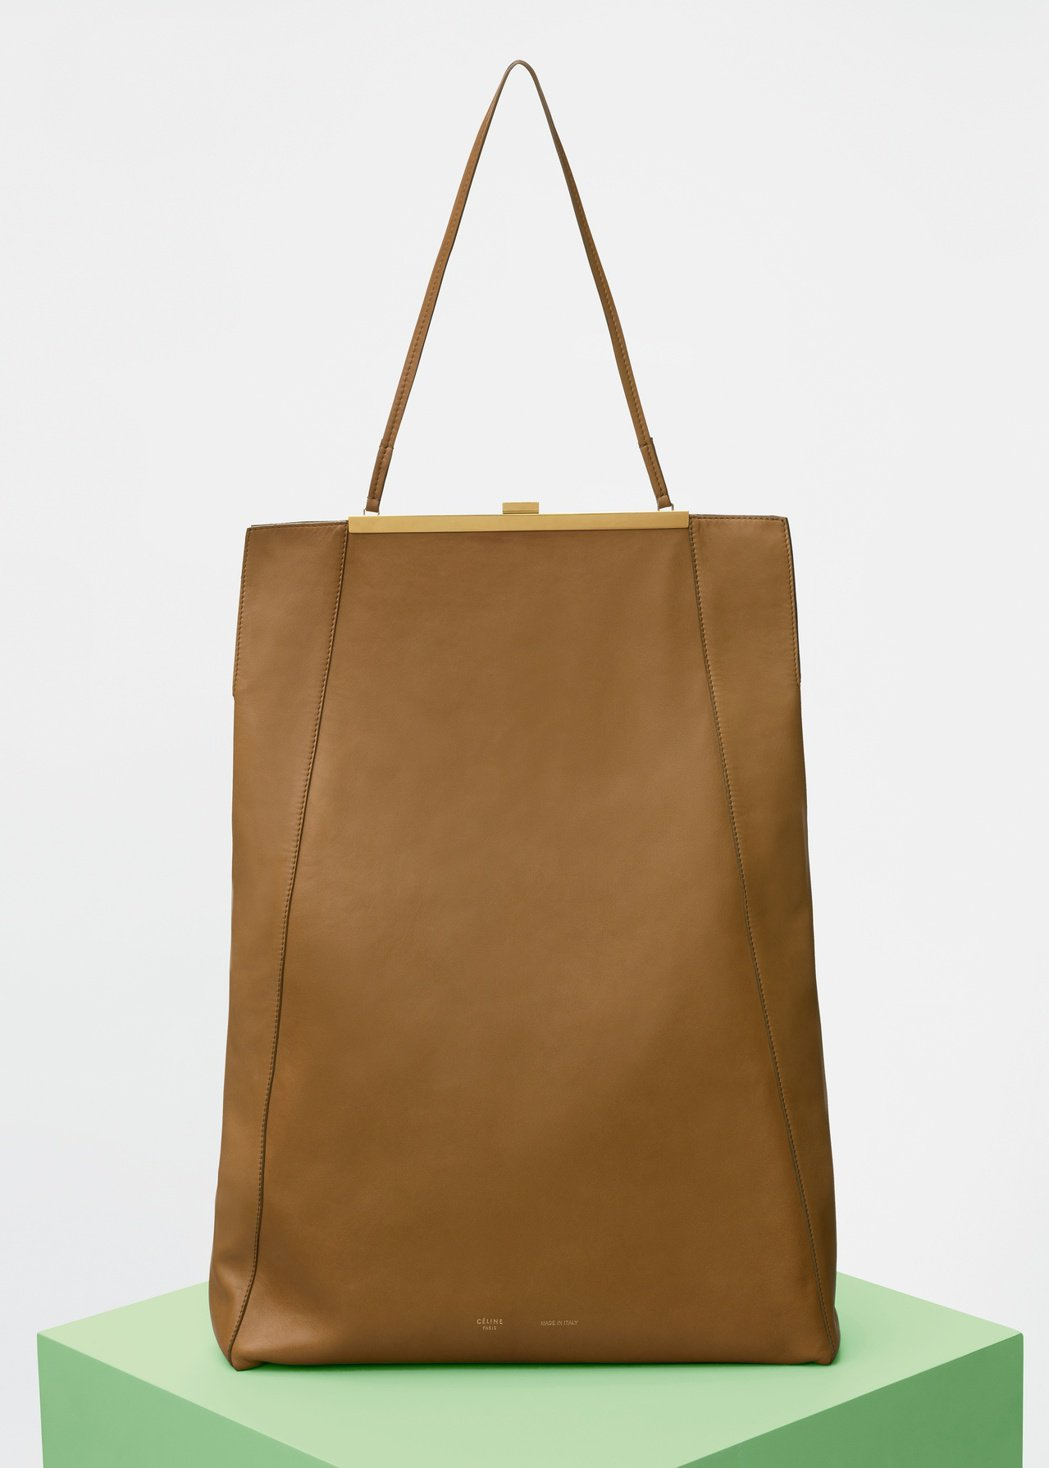 CLASP CABAS金沙色平滑小牛皮肩背包,售價155,000元。圖/CELI...